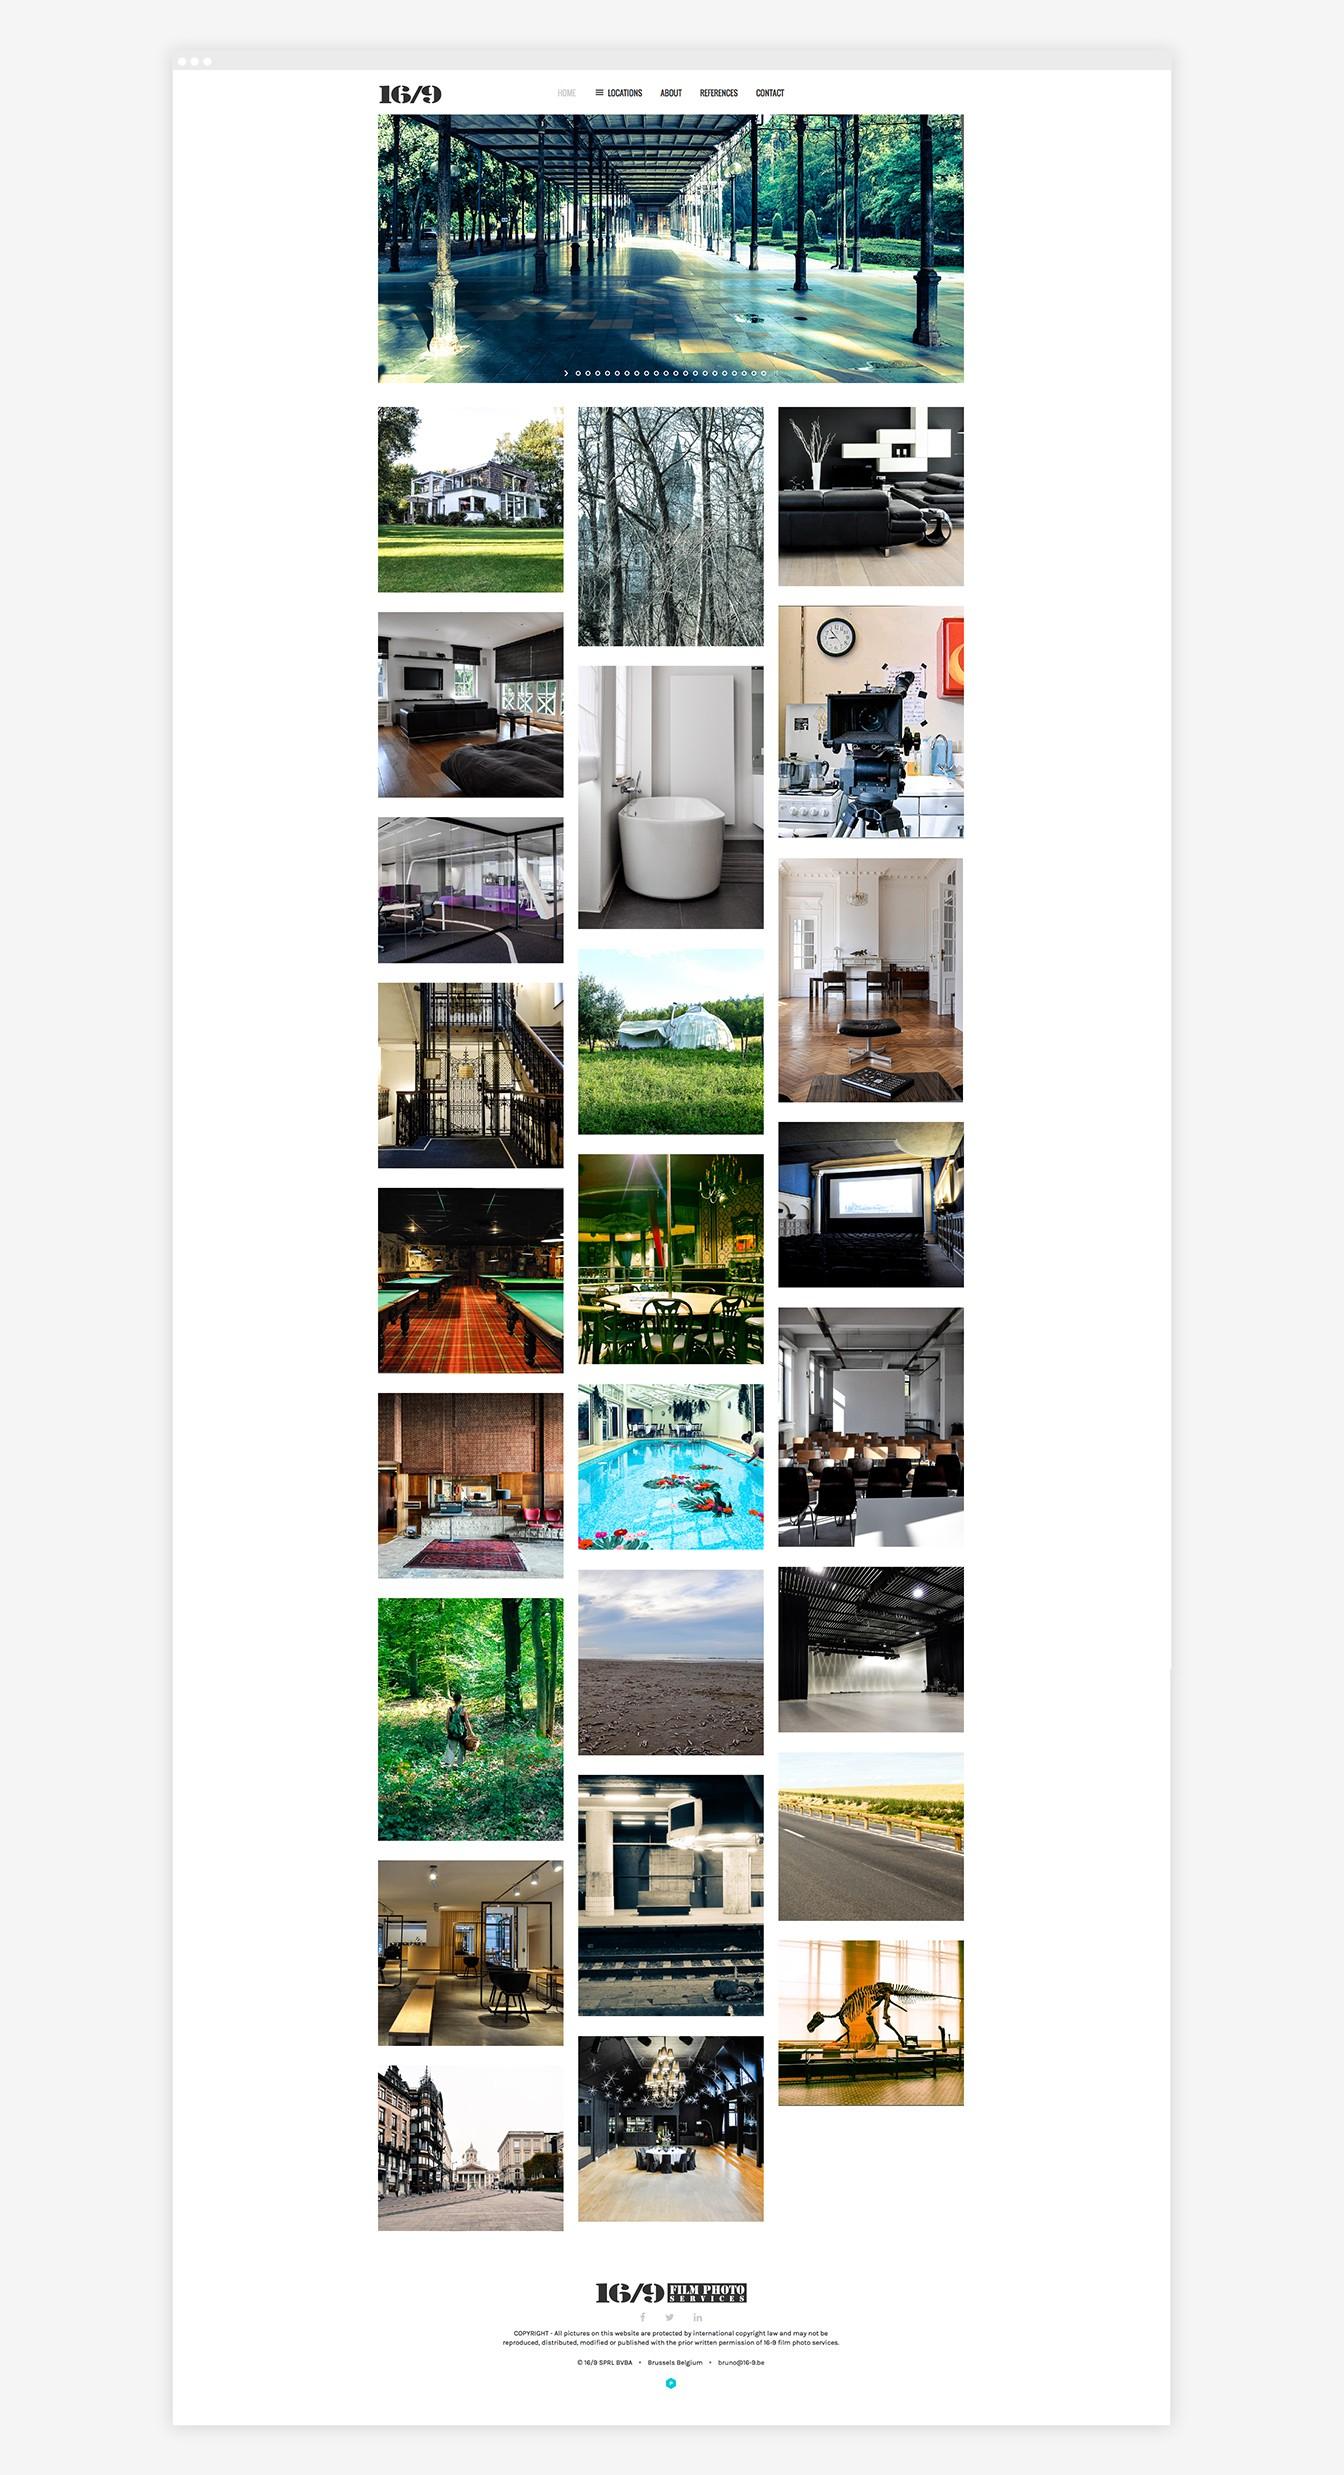 02-bruno-pradez-web-pikteo-webdesign-graphic-design-freelance-paris-bruxelles-lyon